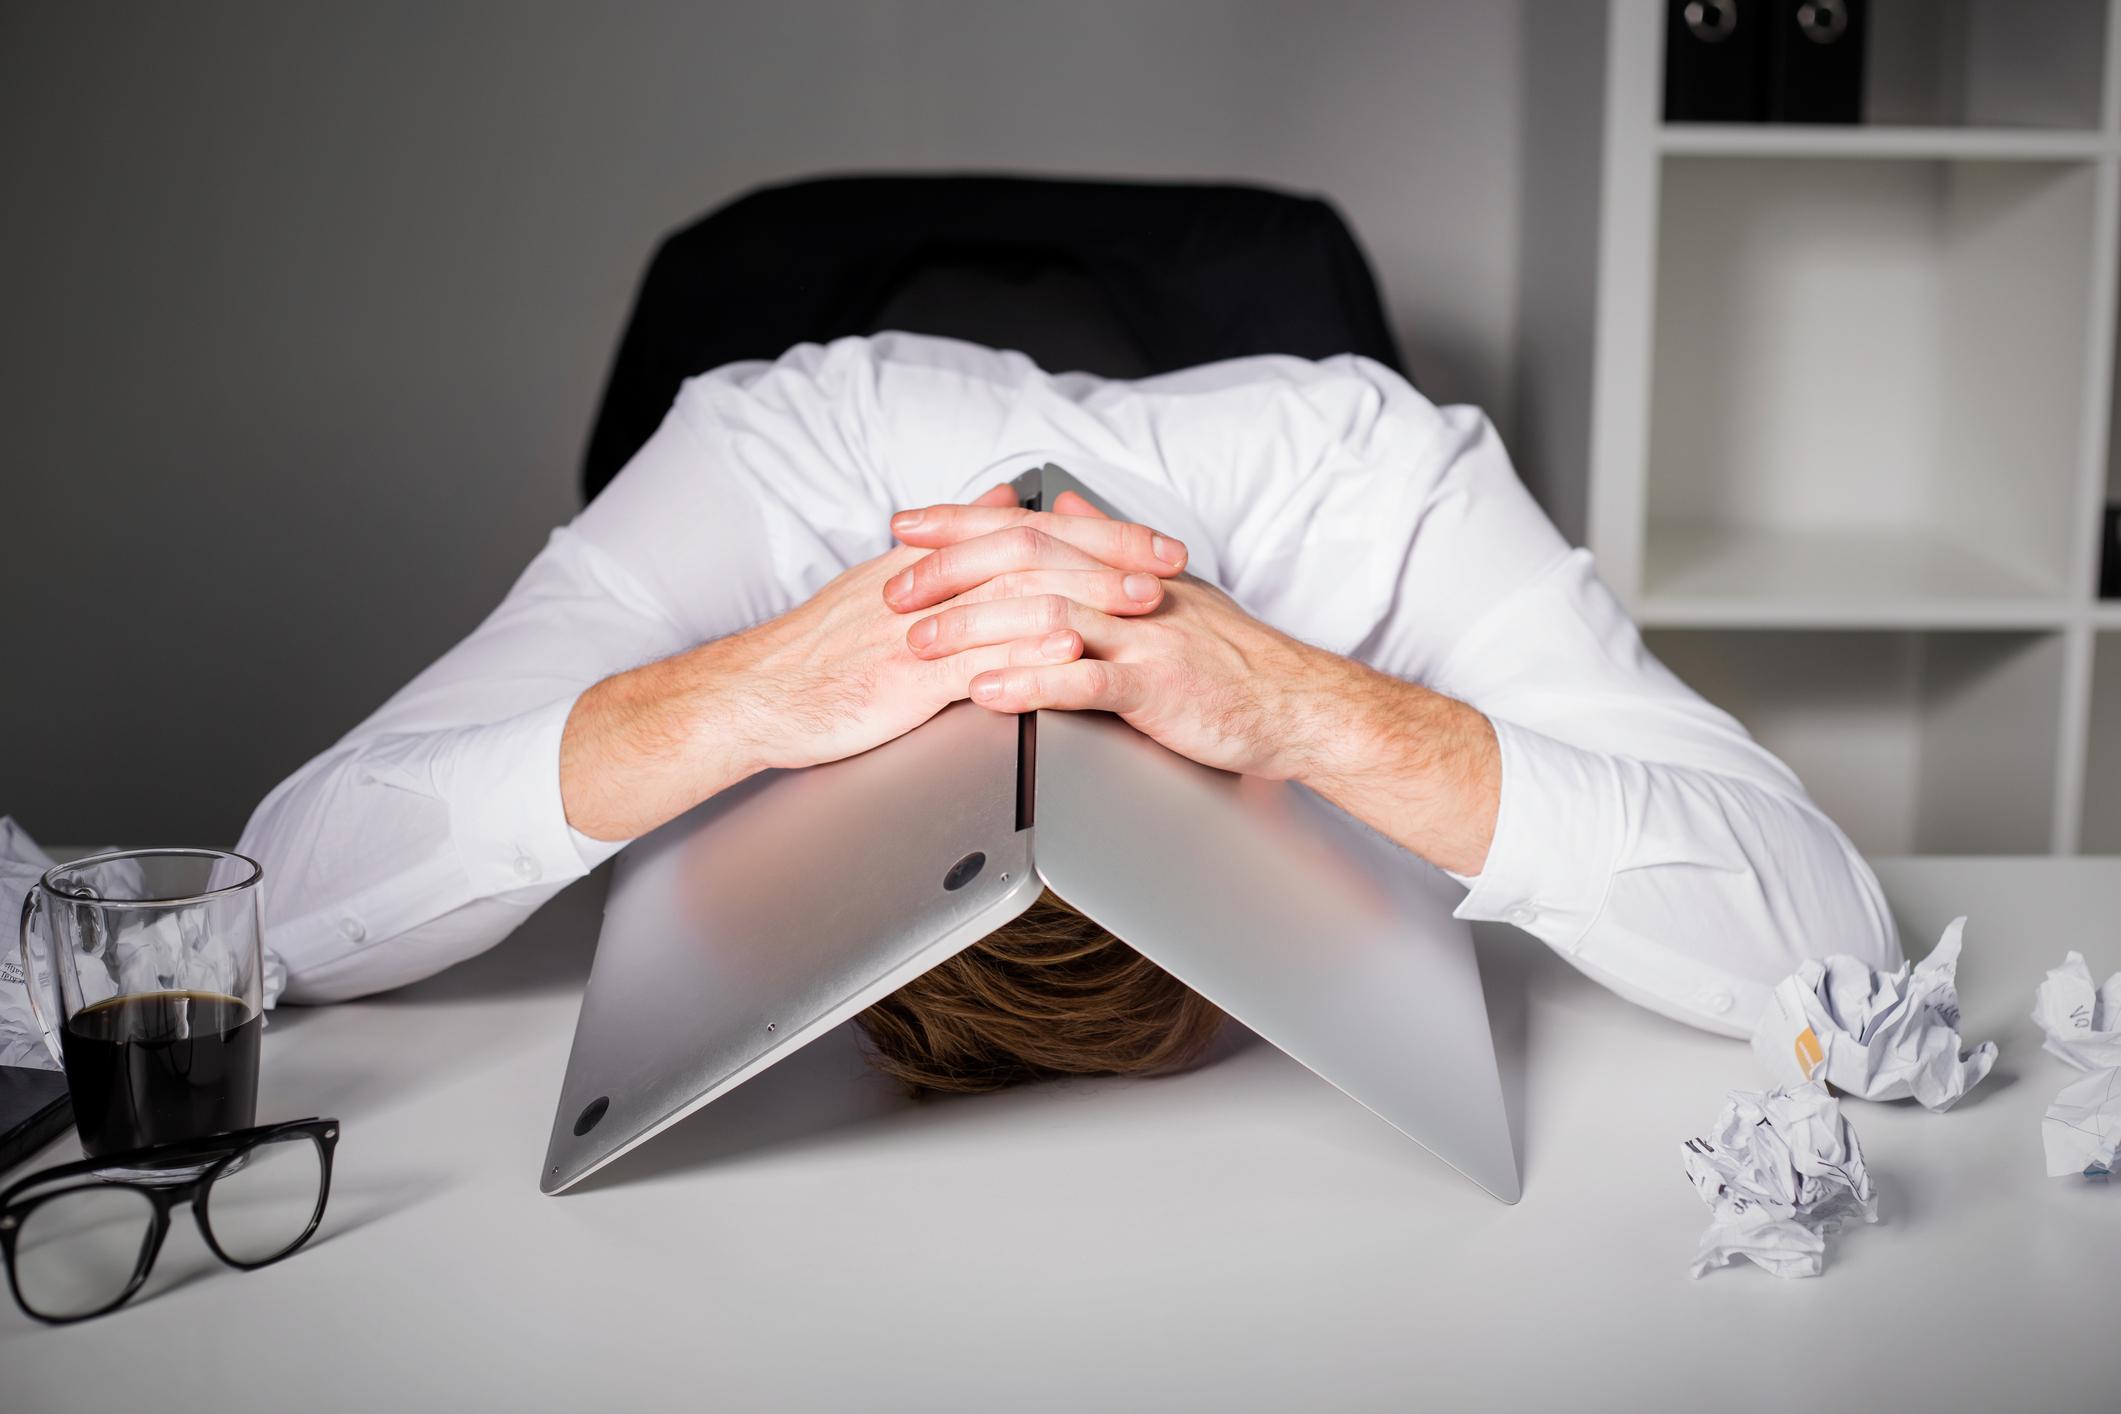 An upset man hides under his laptop.